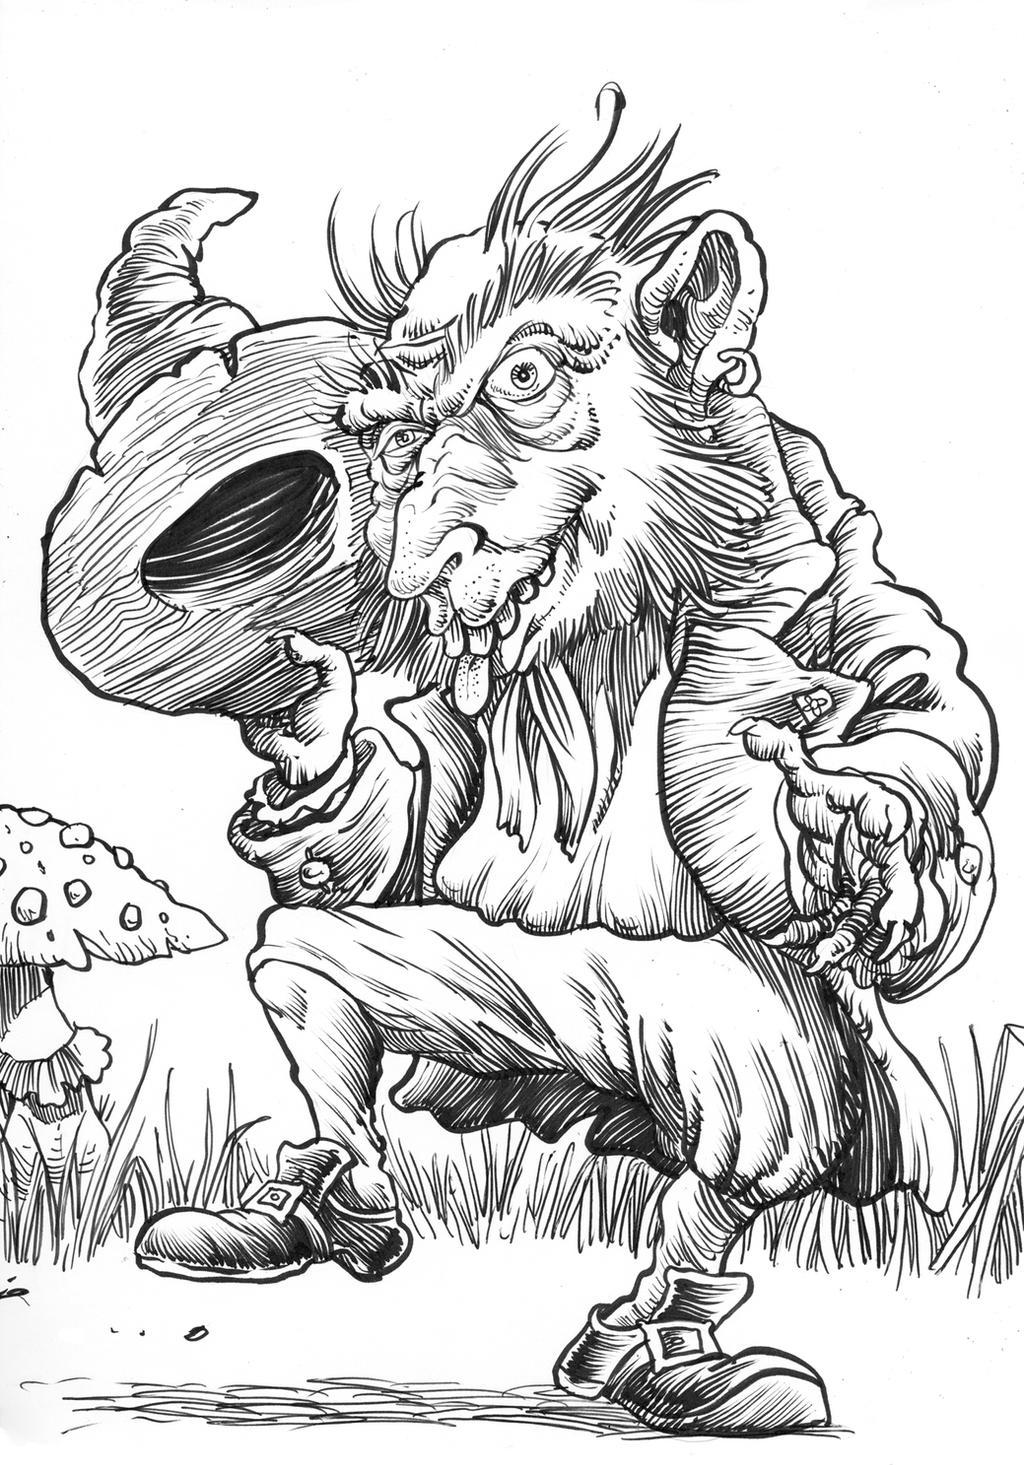 Inktober Monster Challenge 30: Far Darrig by Loneanimator